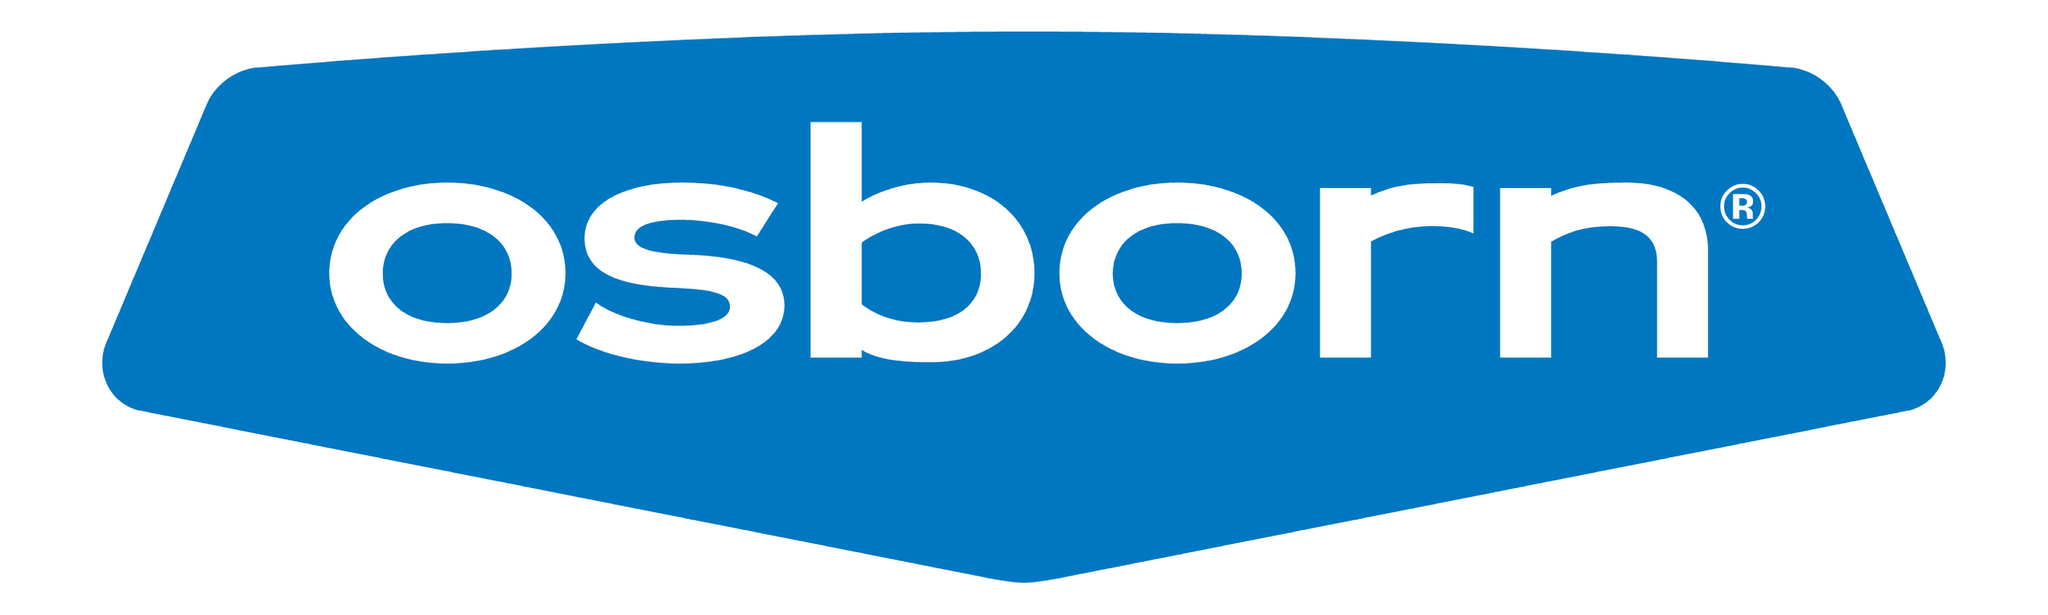 OSBORN LTD